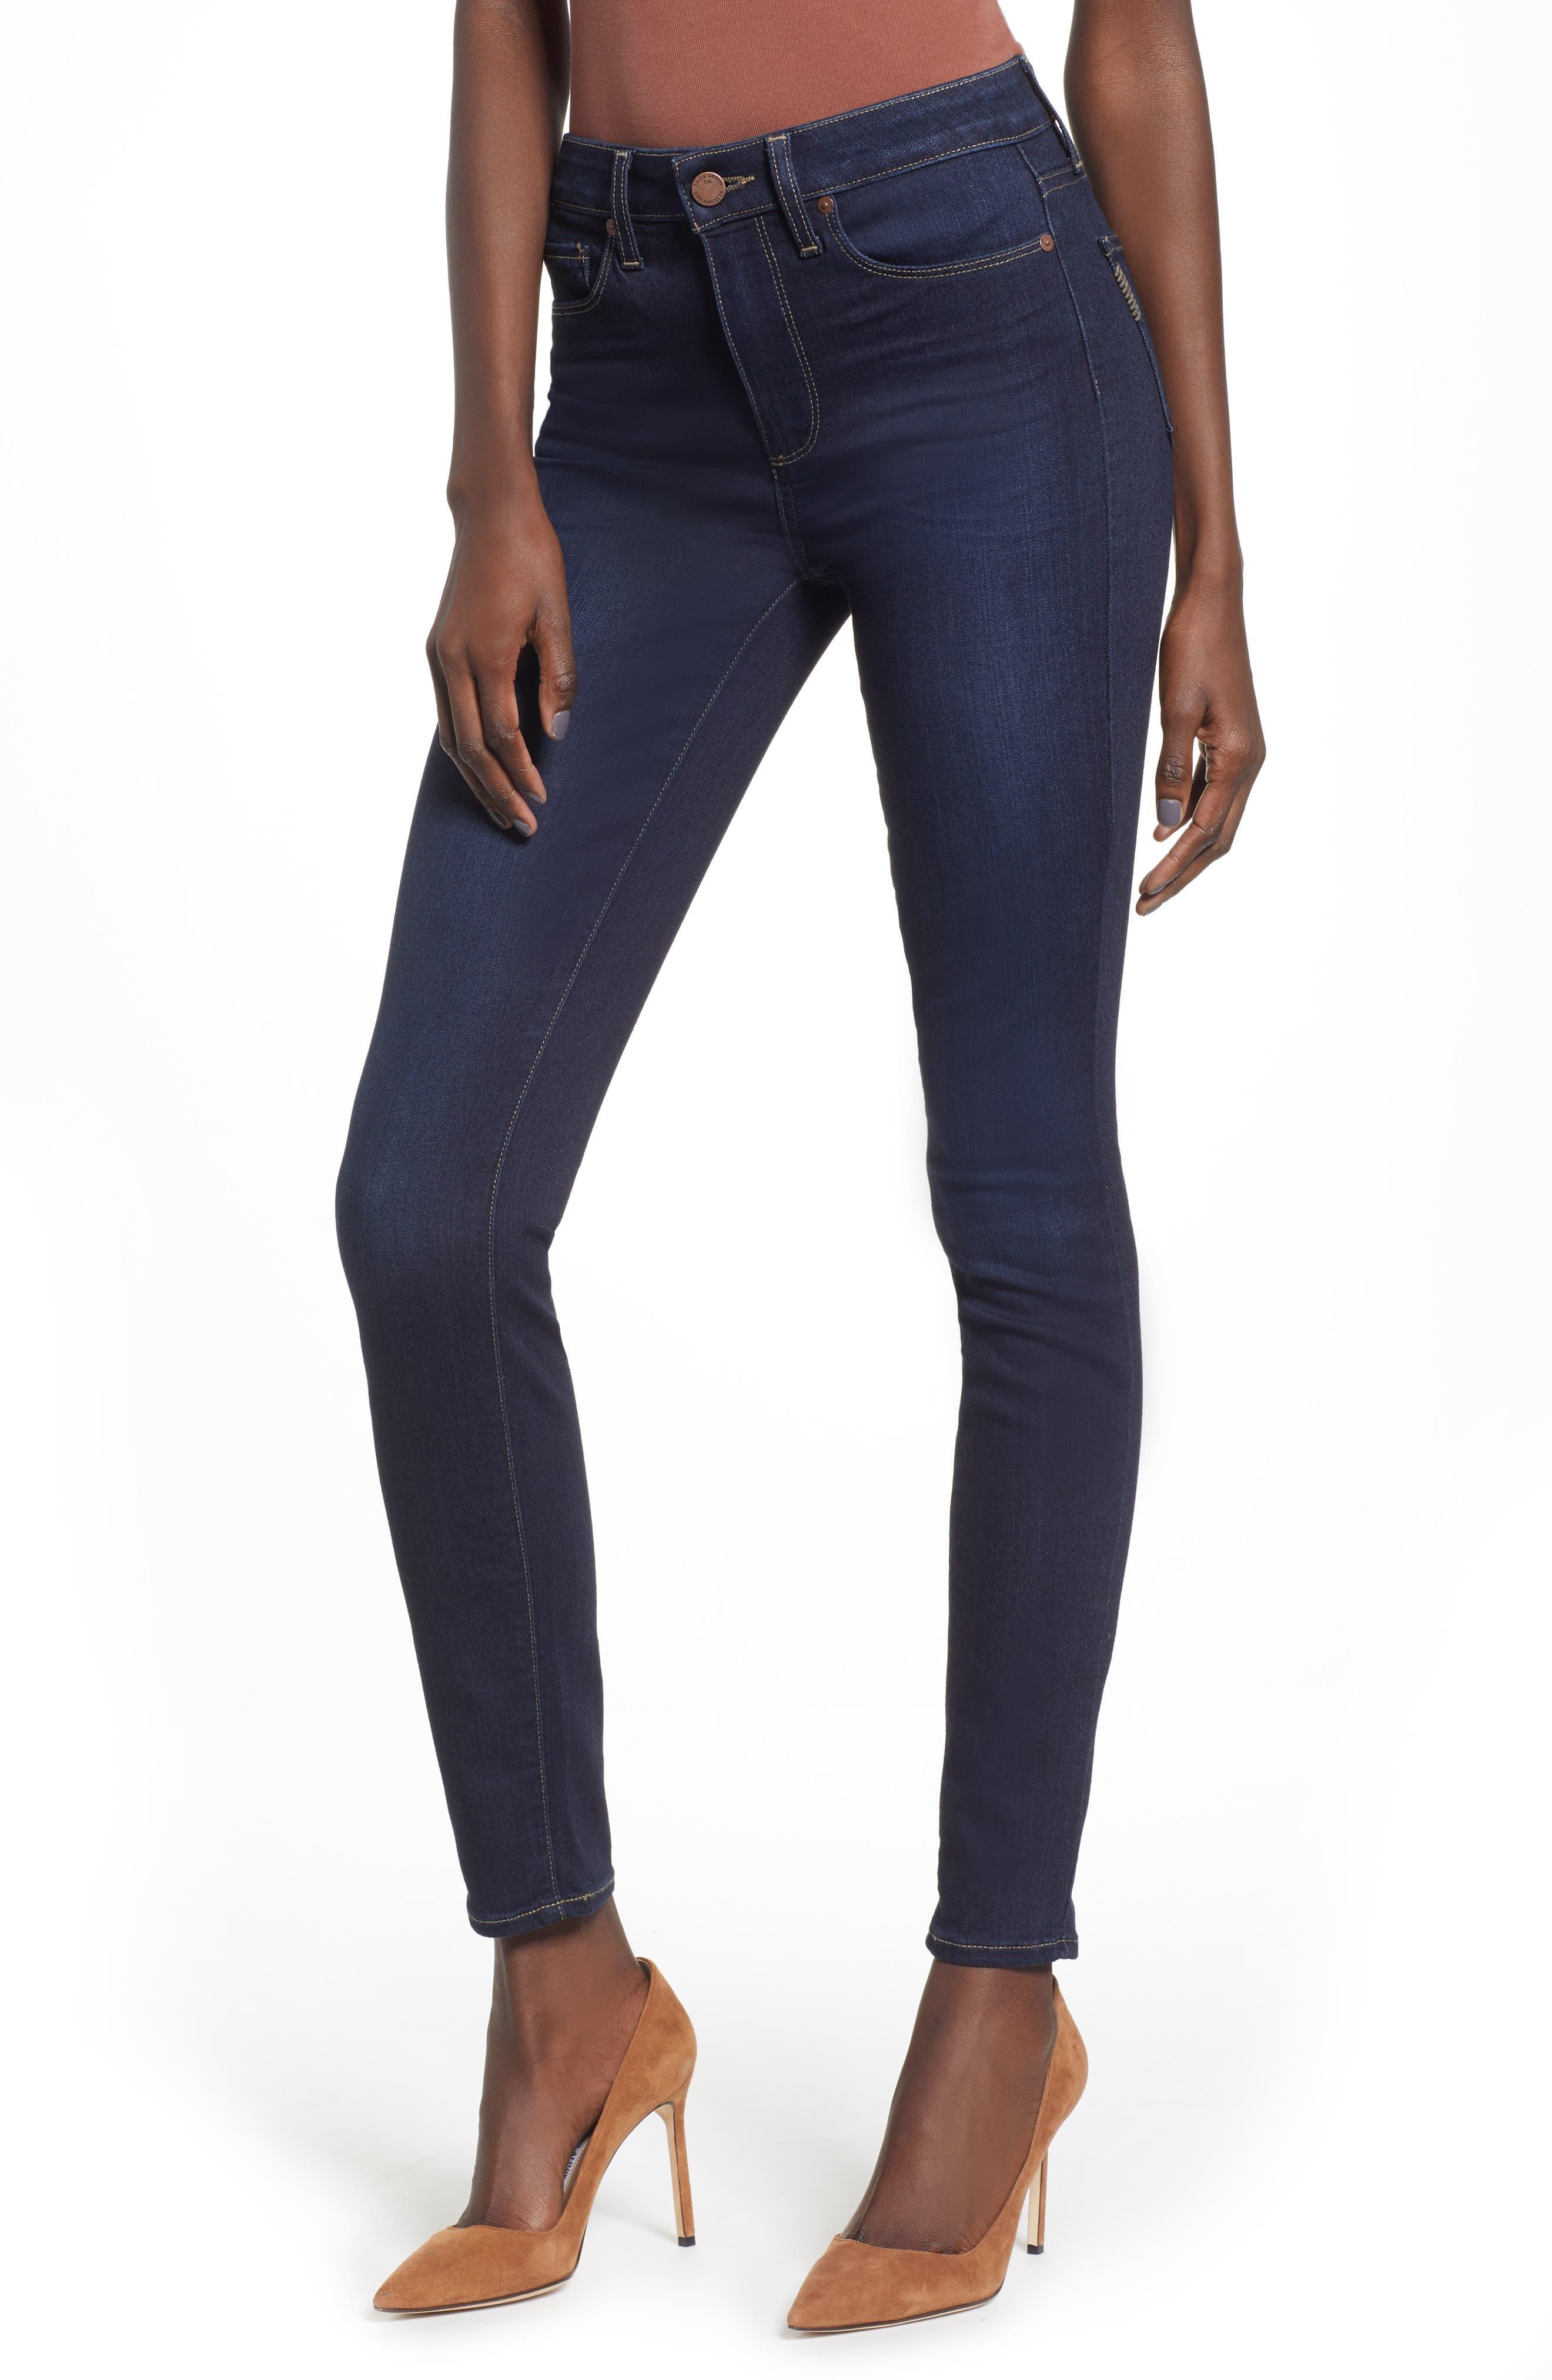 Transcend - Hoxton High Waist Ultra Skinny Jeans, Main, color, SANIA